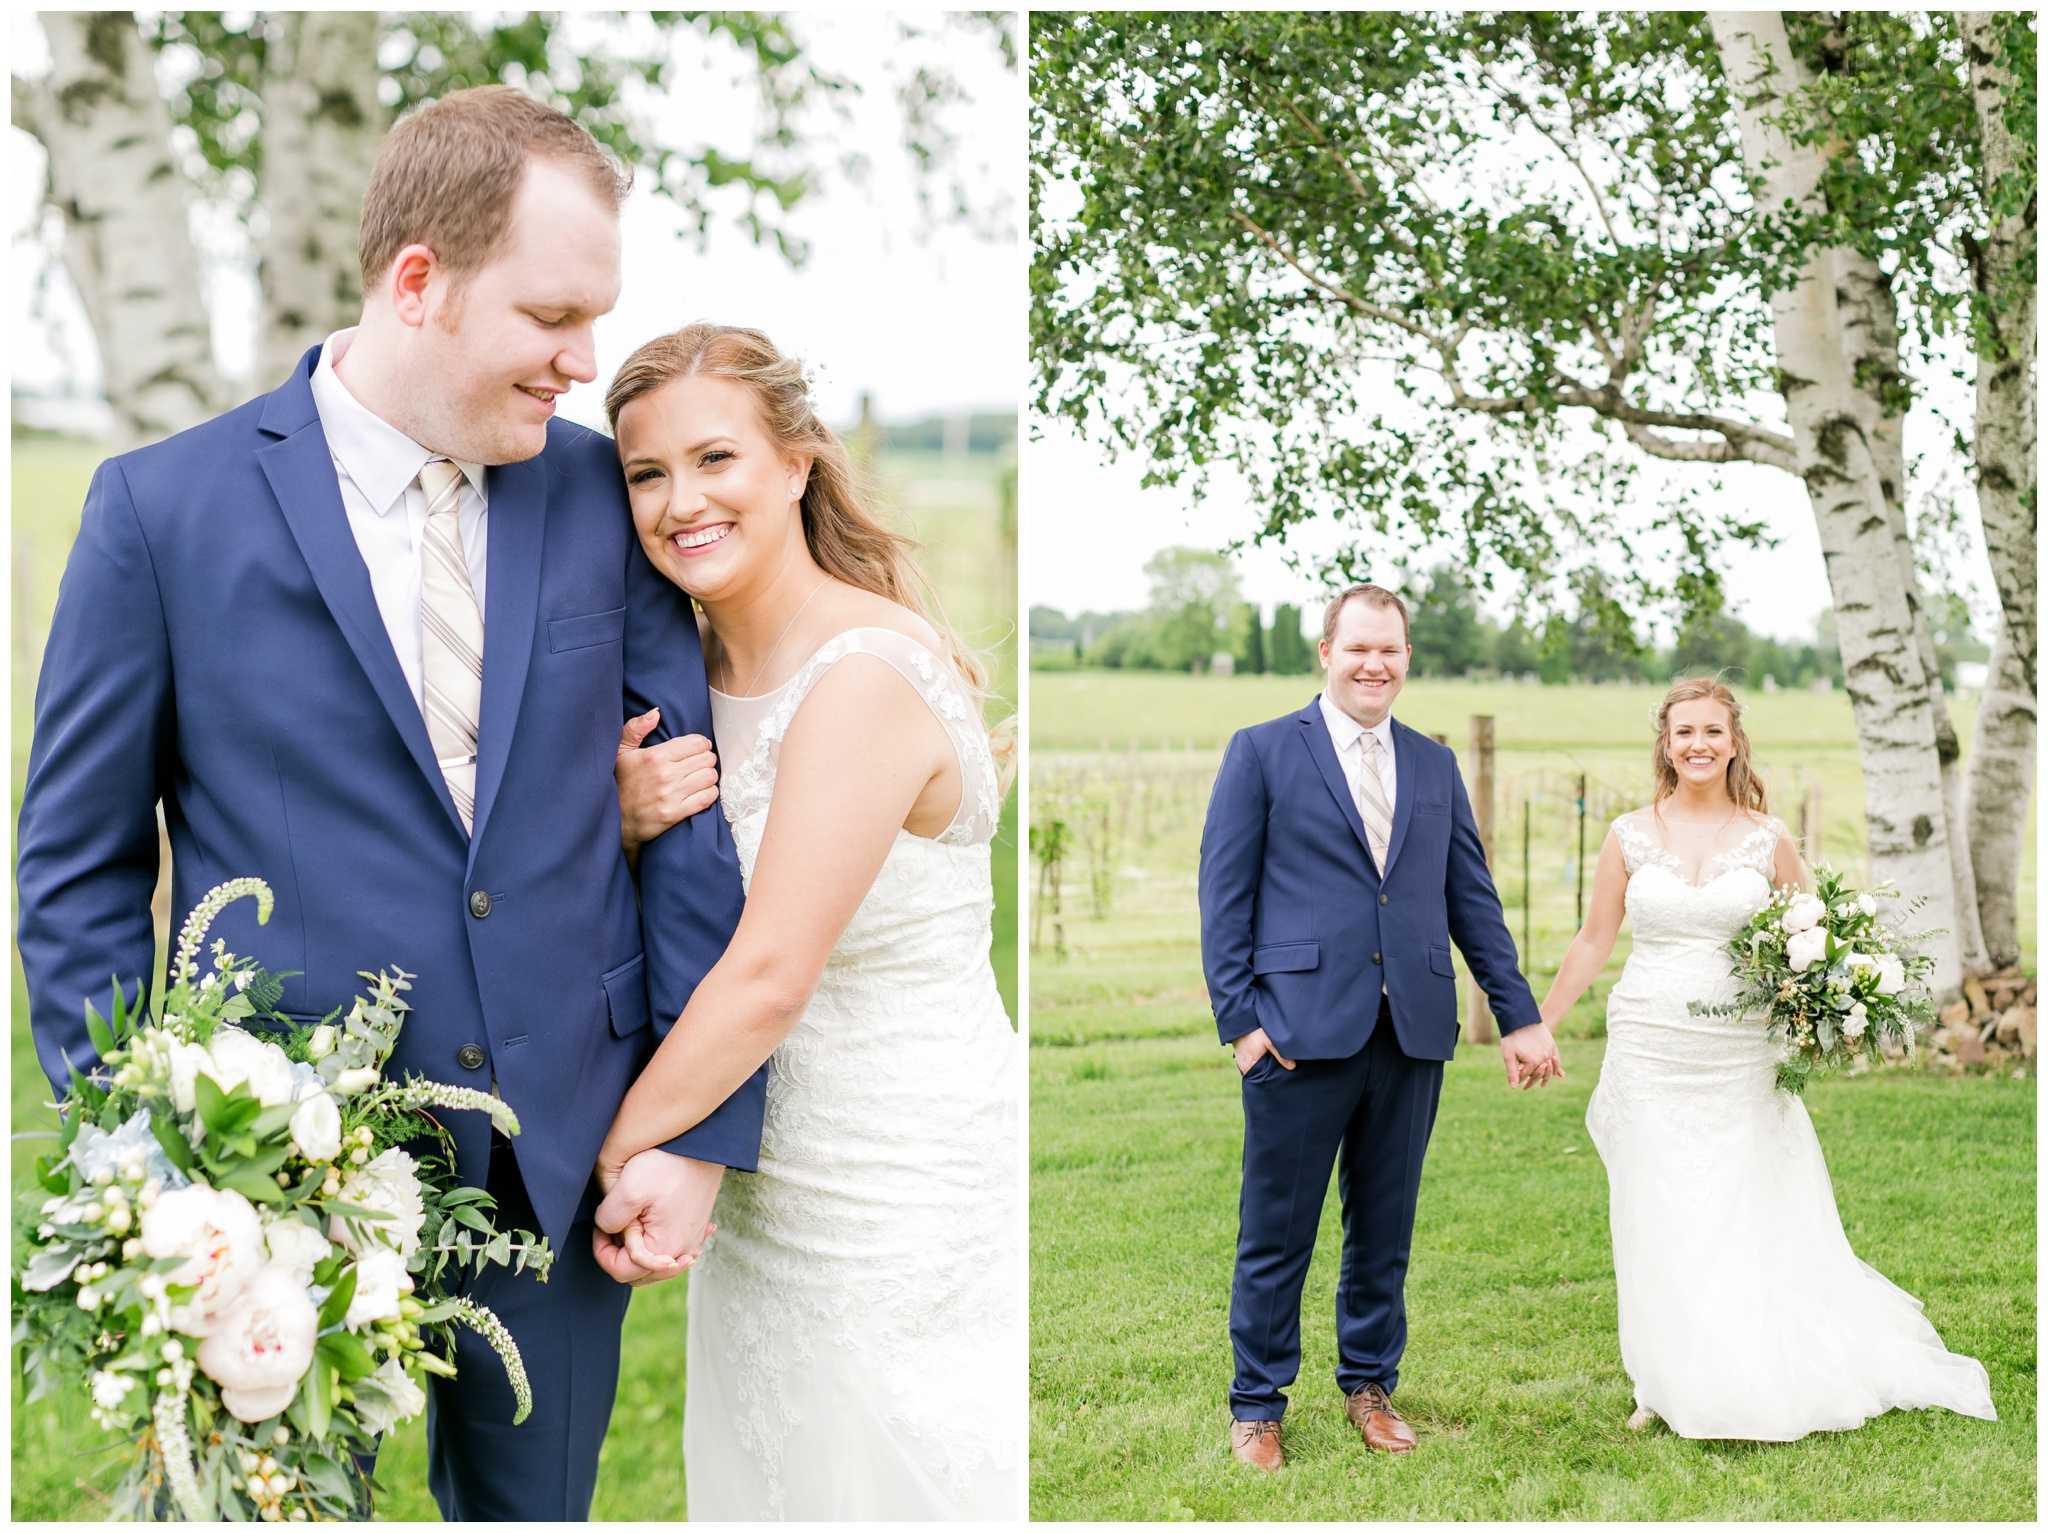 over_the_vines_wedding_edgerton_wisconsin_wedding_caynay_photo_3991.jpg